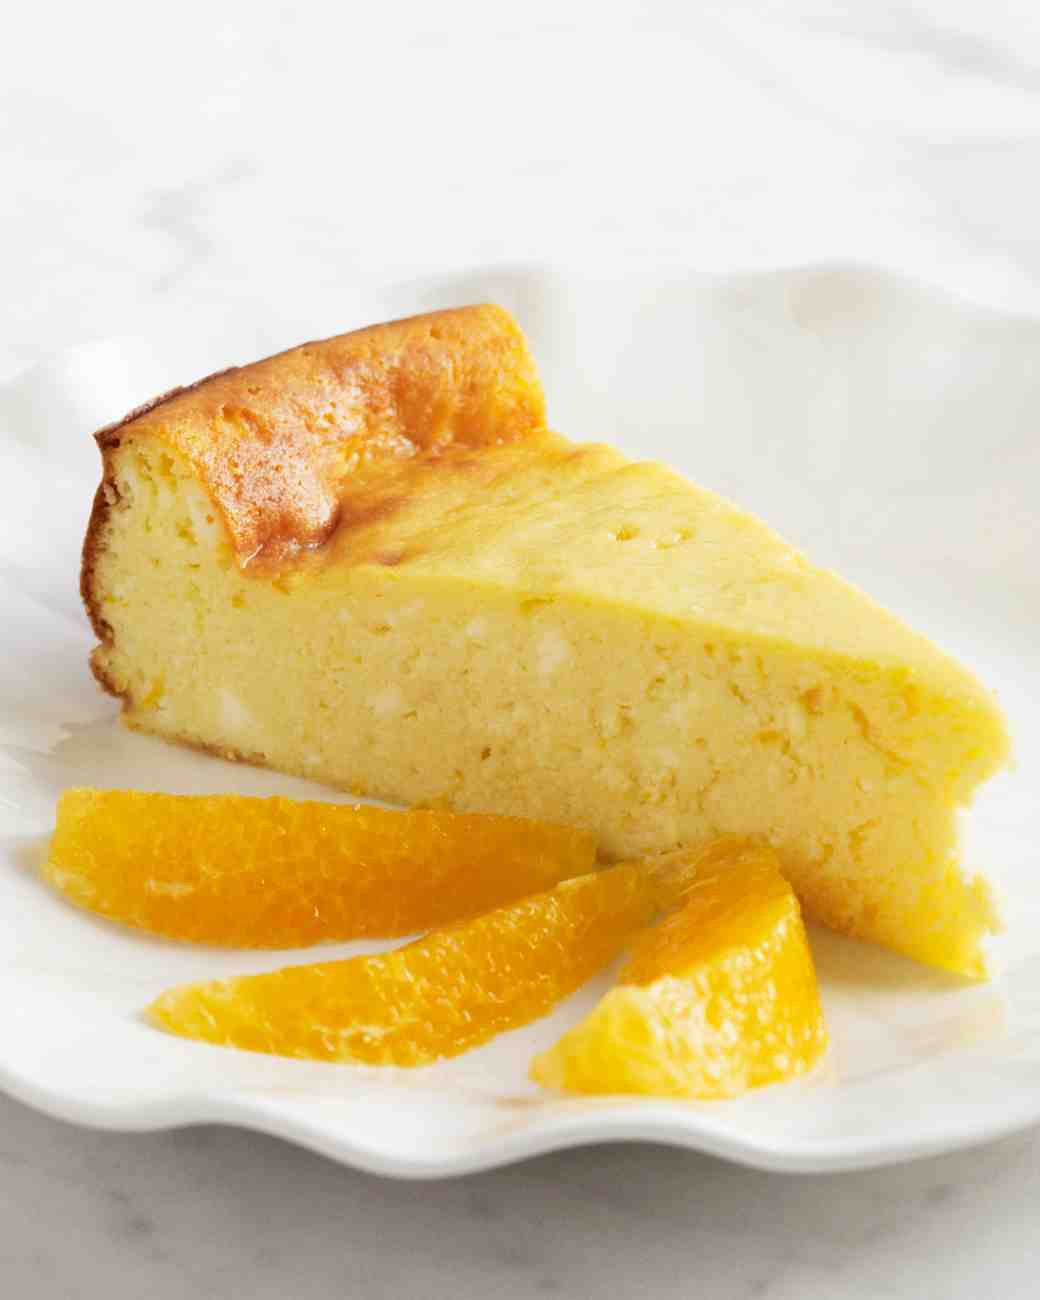 Italian Cheesecake Recipe  Italian Ricotta Cheesecake Recipe & Video